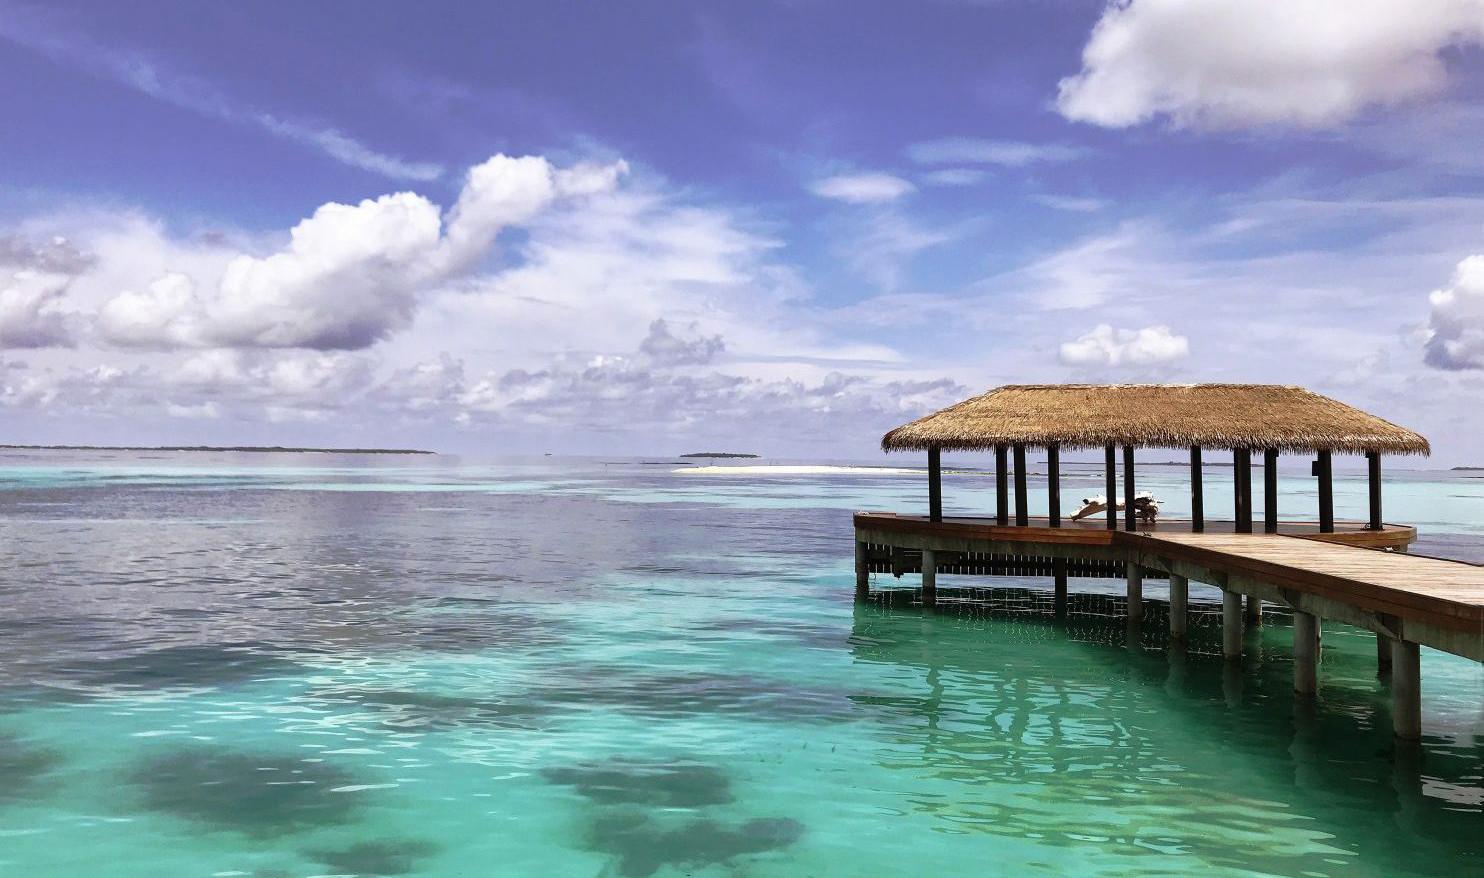 news-main-noku-maldives-welcomes-modern-french-cuisine-expert-tarique-aziz-as-new-executive-chef.1554973623.jpg